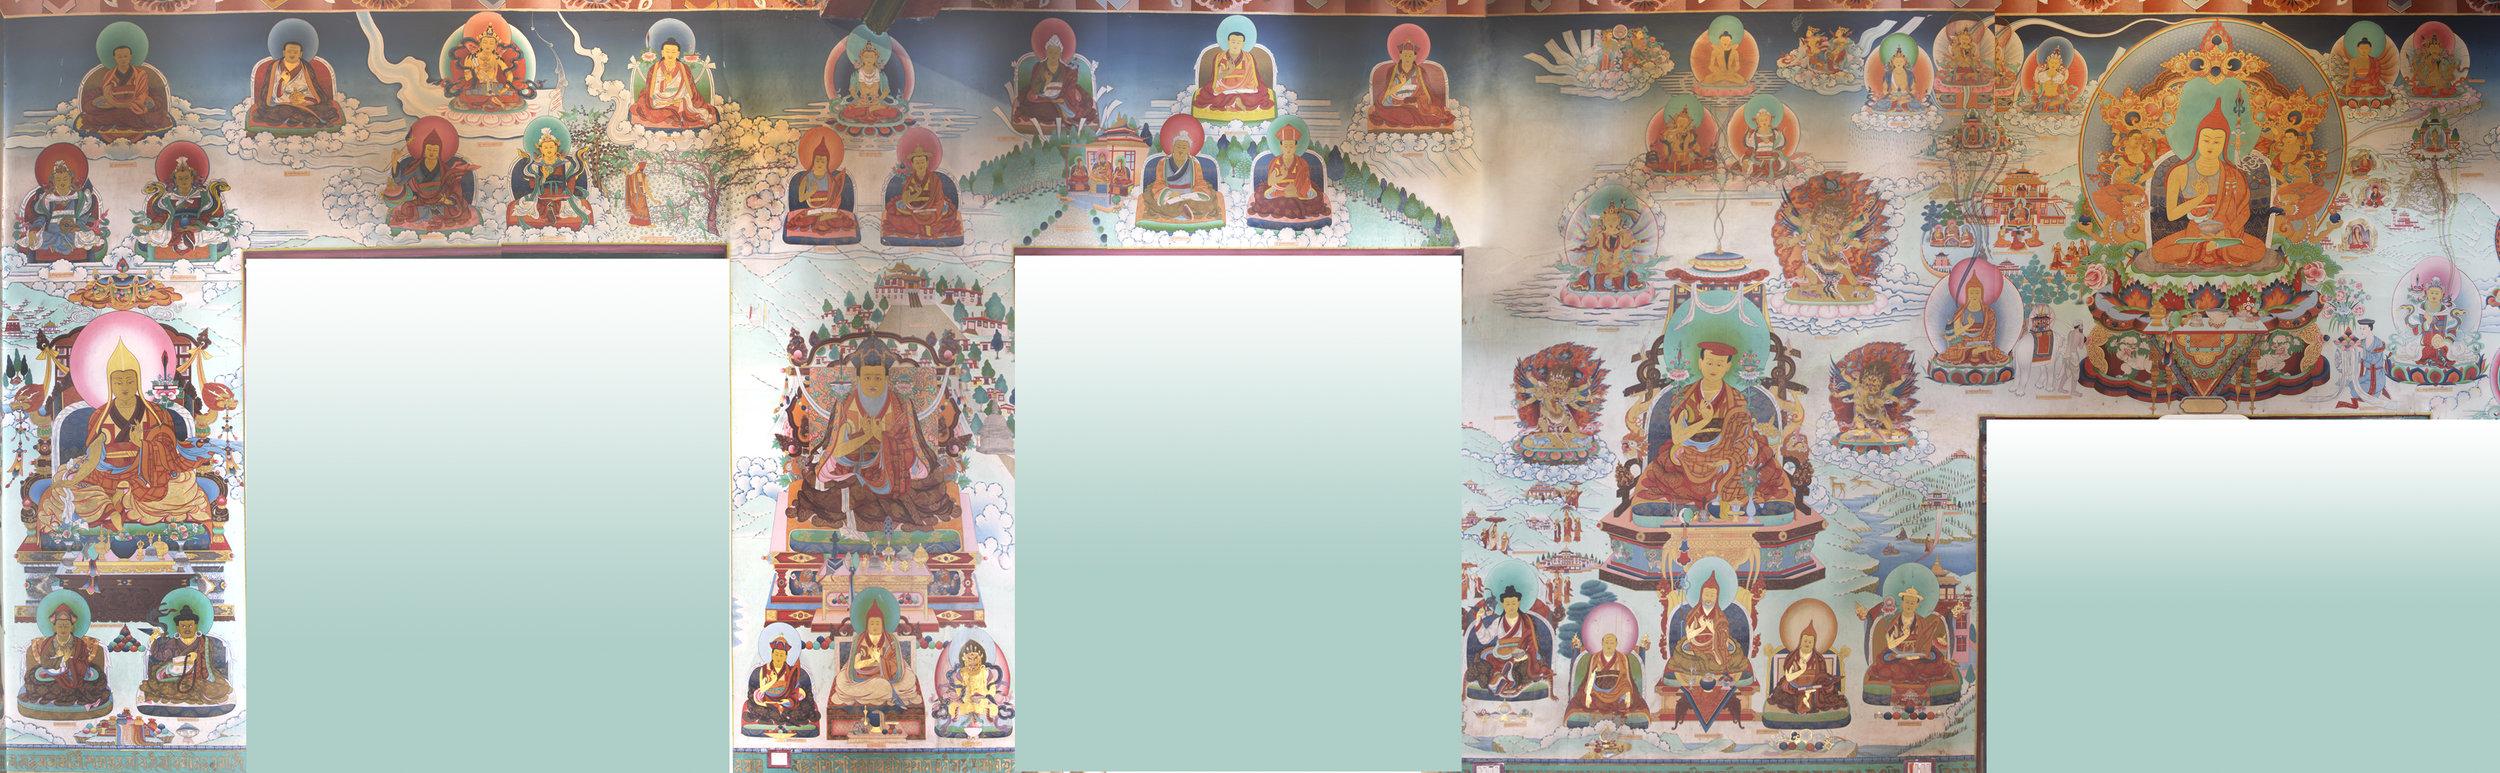 The South Wall depicts the 1st Rabjam Rinpoche (Shechen Rabjam Tenpe Gyaltsen), Mindrolling Terchen, Nyak Jnanakumara, the great Guru Padmasambhava, and Nyangrel Nyima Oser. Smaller figures include Khenpo Shantarakshita, King Trisong Detsun, Vairostana, Dorje Lingpa, and Drapa Ngonshe (discoverer of the Four Medicine Tantras).